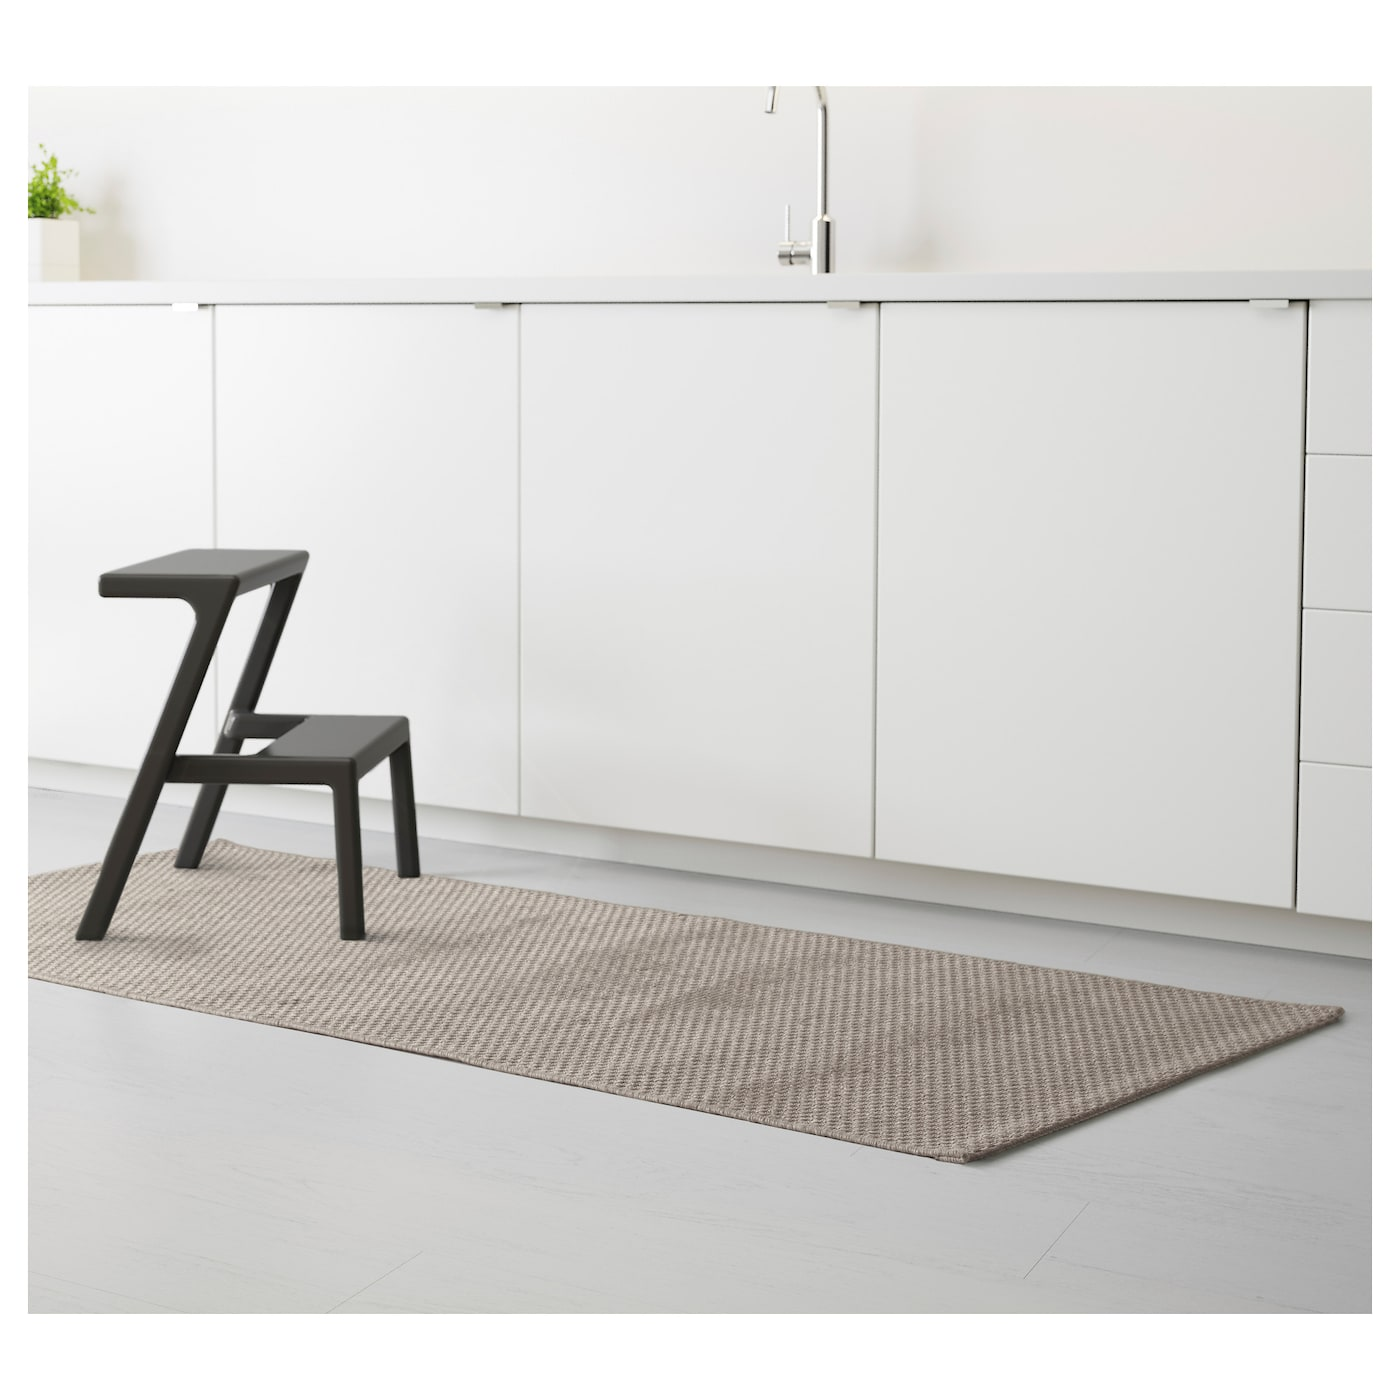 morum tapis tiss plat int ext rieur beige 80 x 200 cm ikea. Black Bedroom Furniture Sets. Home Design Ideas